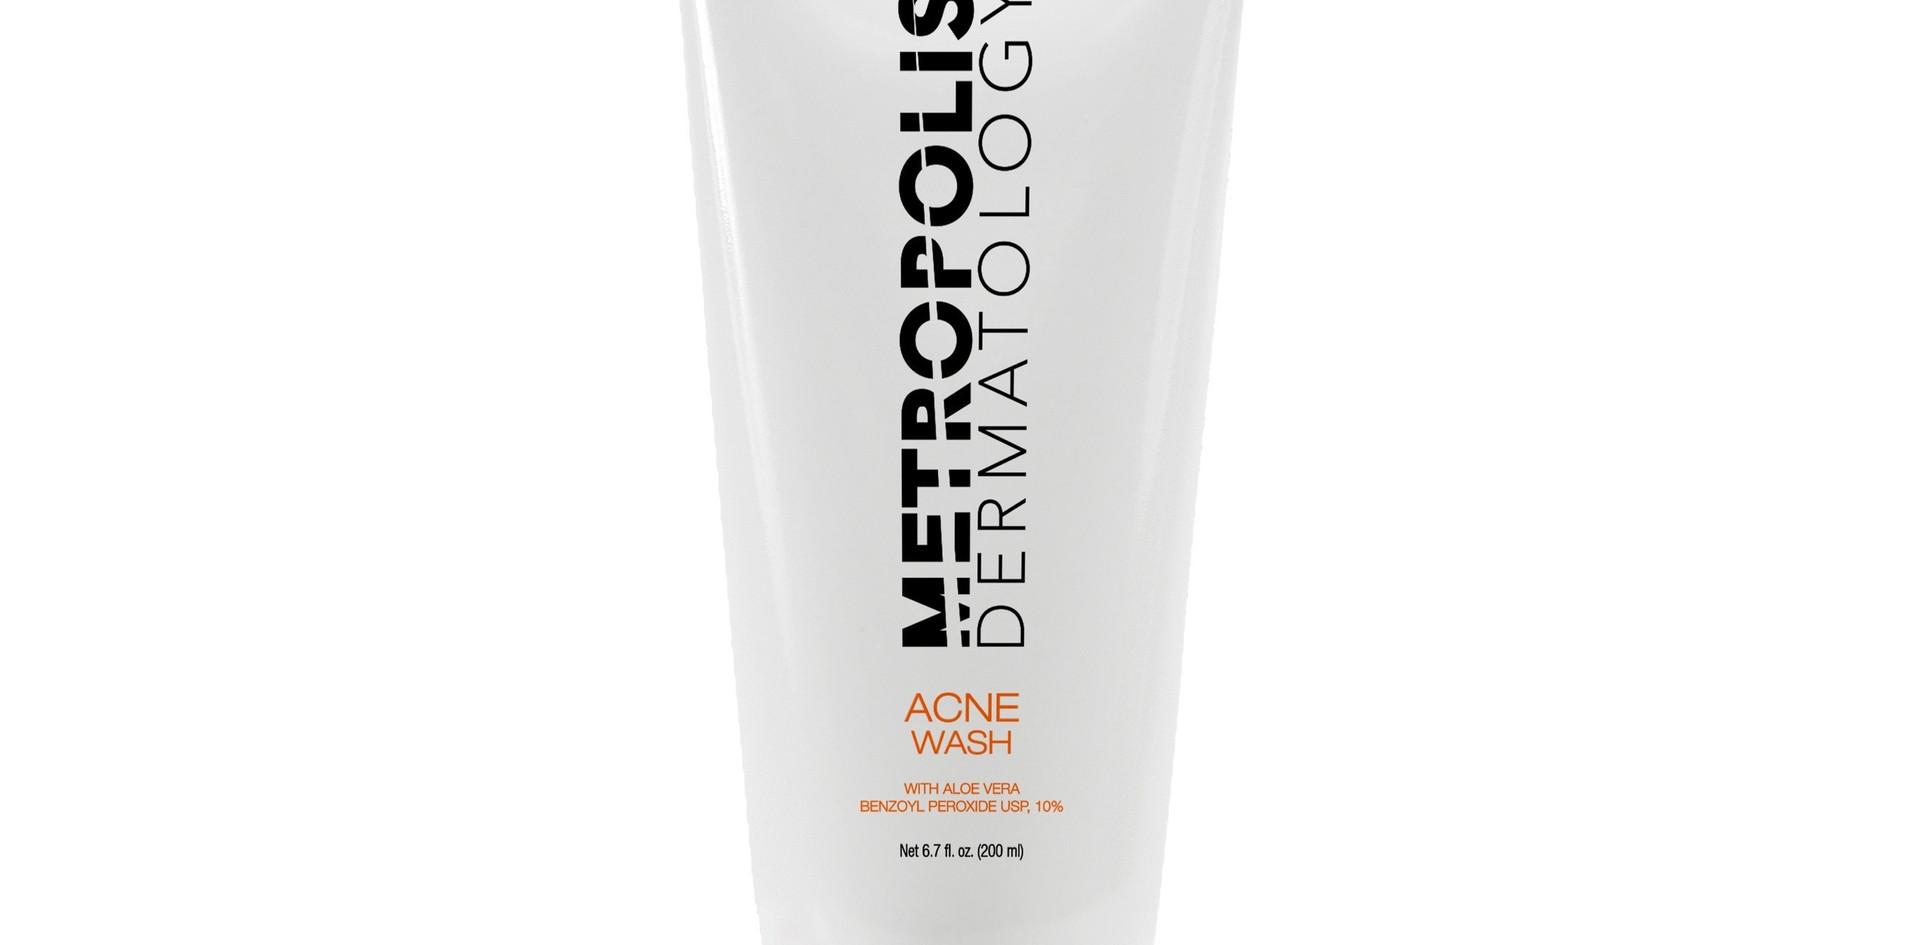 Acne Wash with Aloe Vera